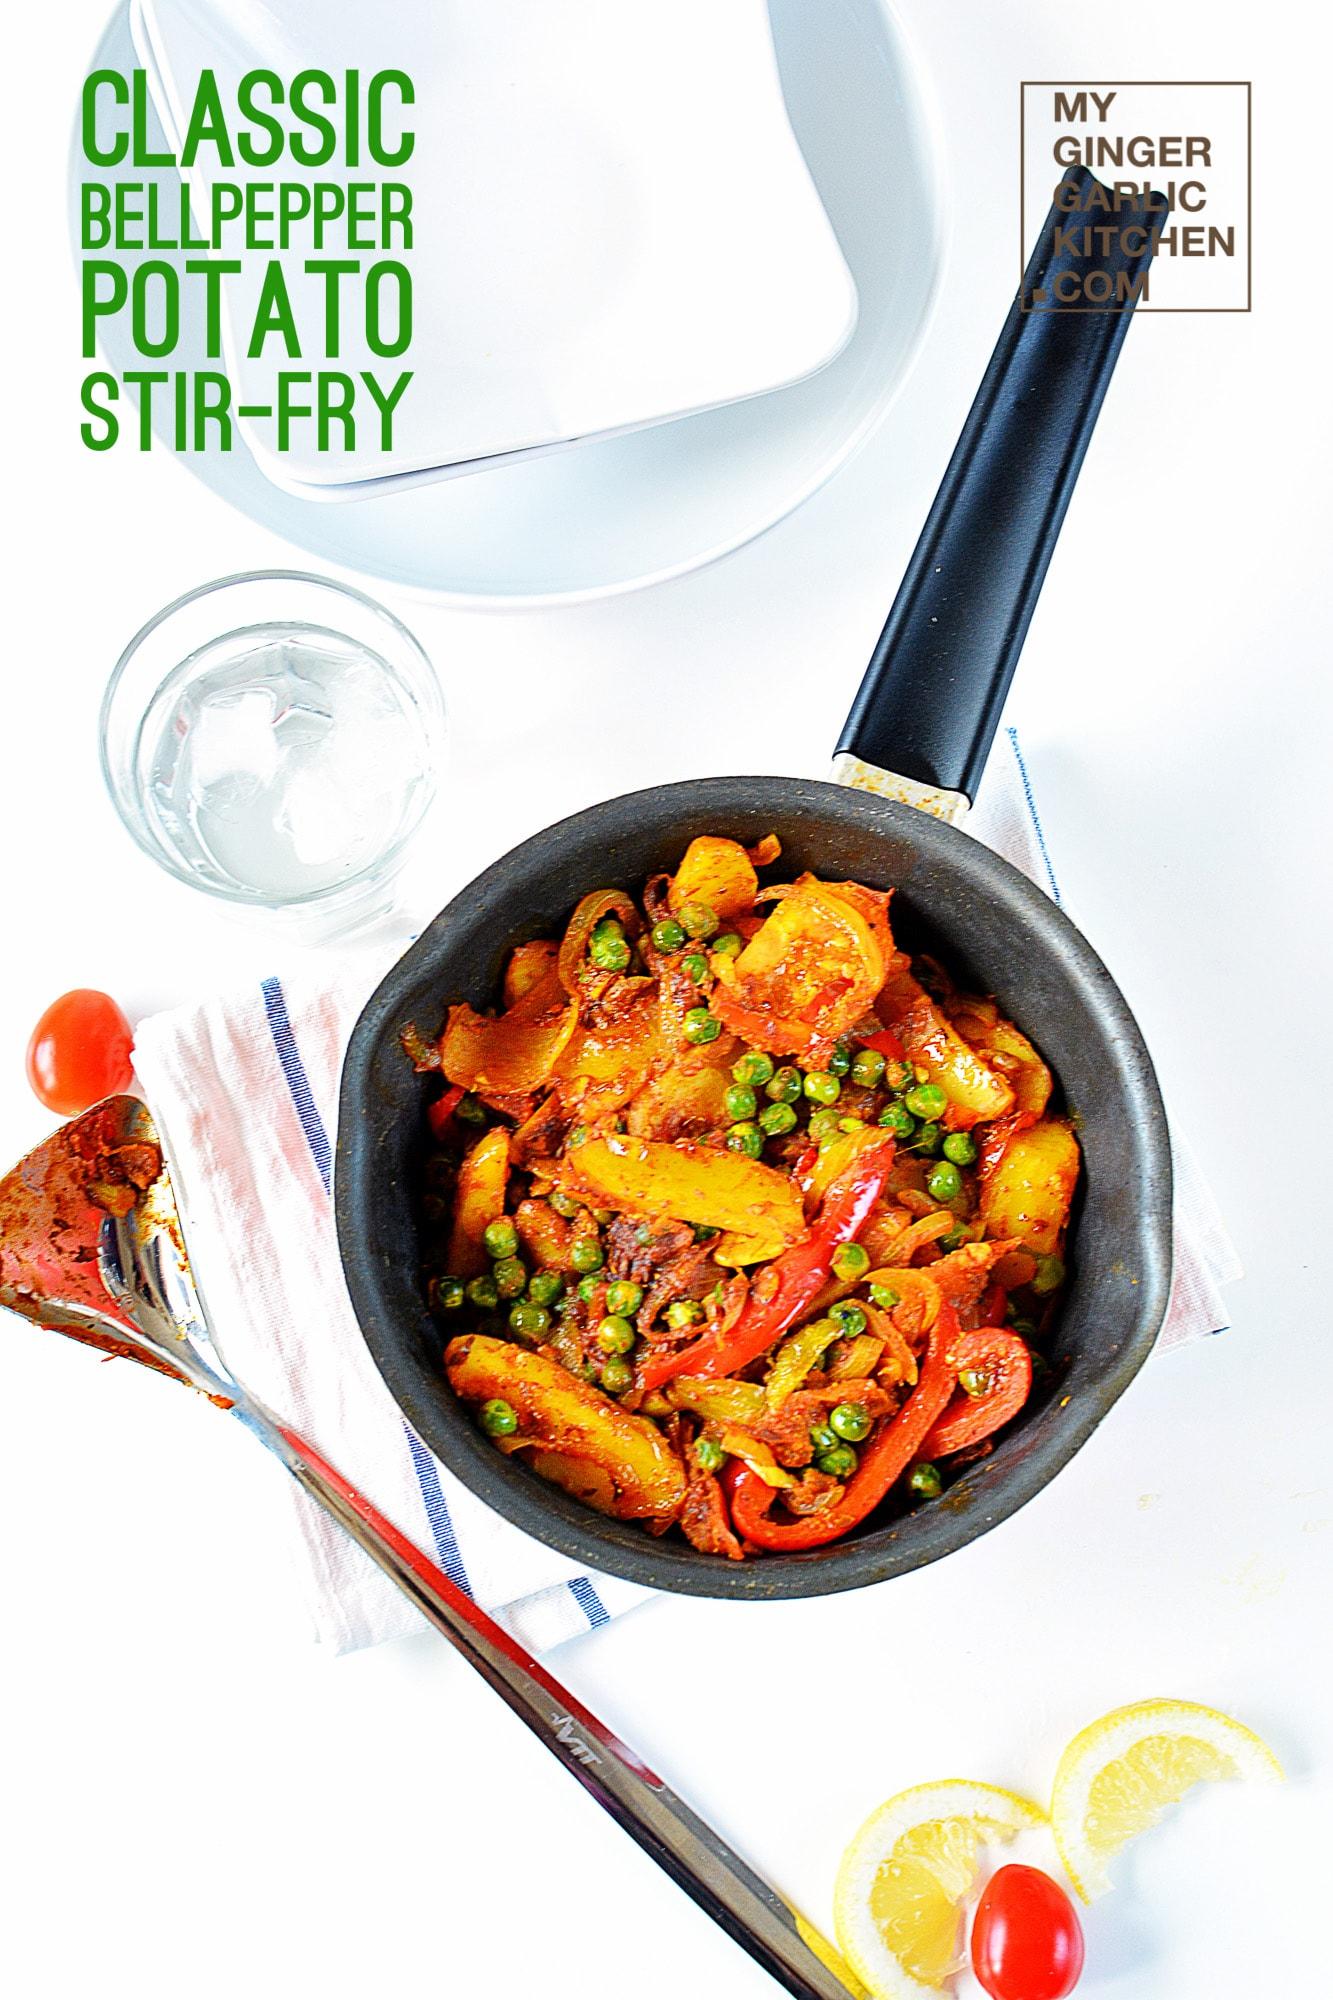 Image - recipe classic bellpepper potato peas stir fry anupama paliwal my ginger garlic kitchen 3